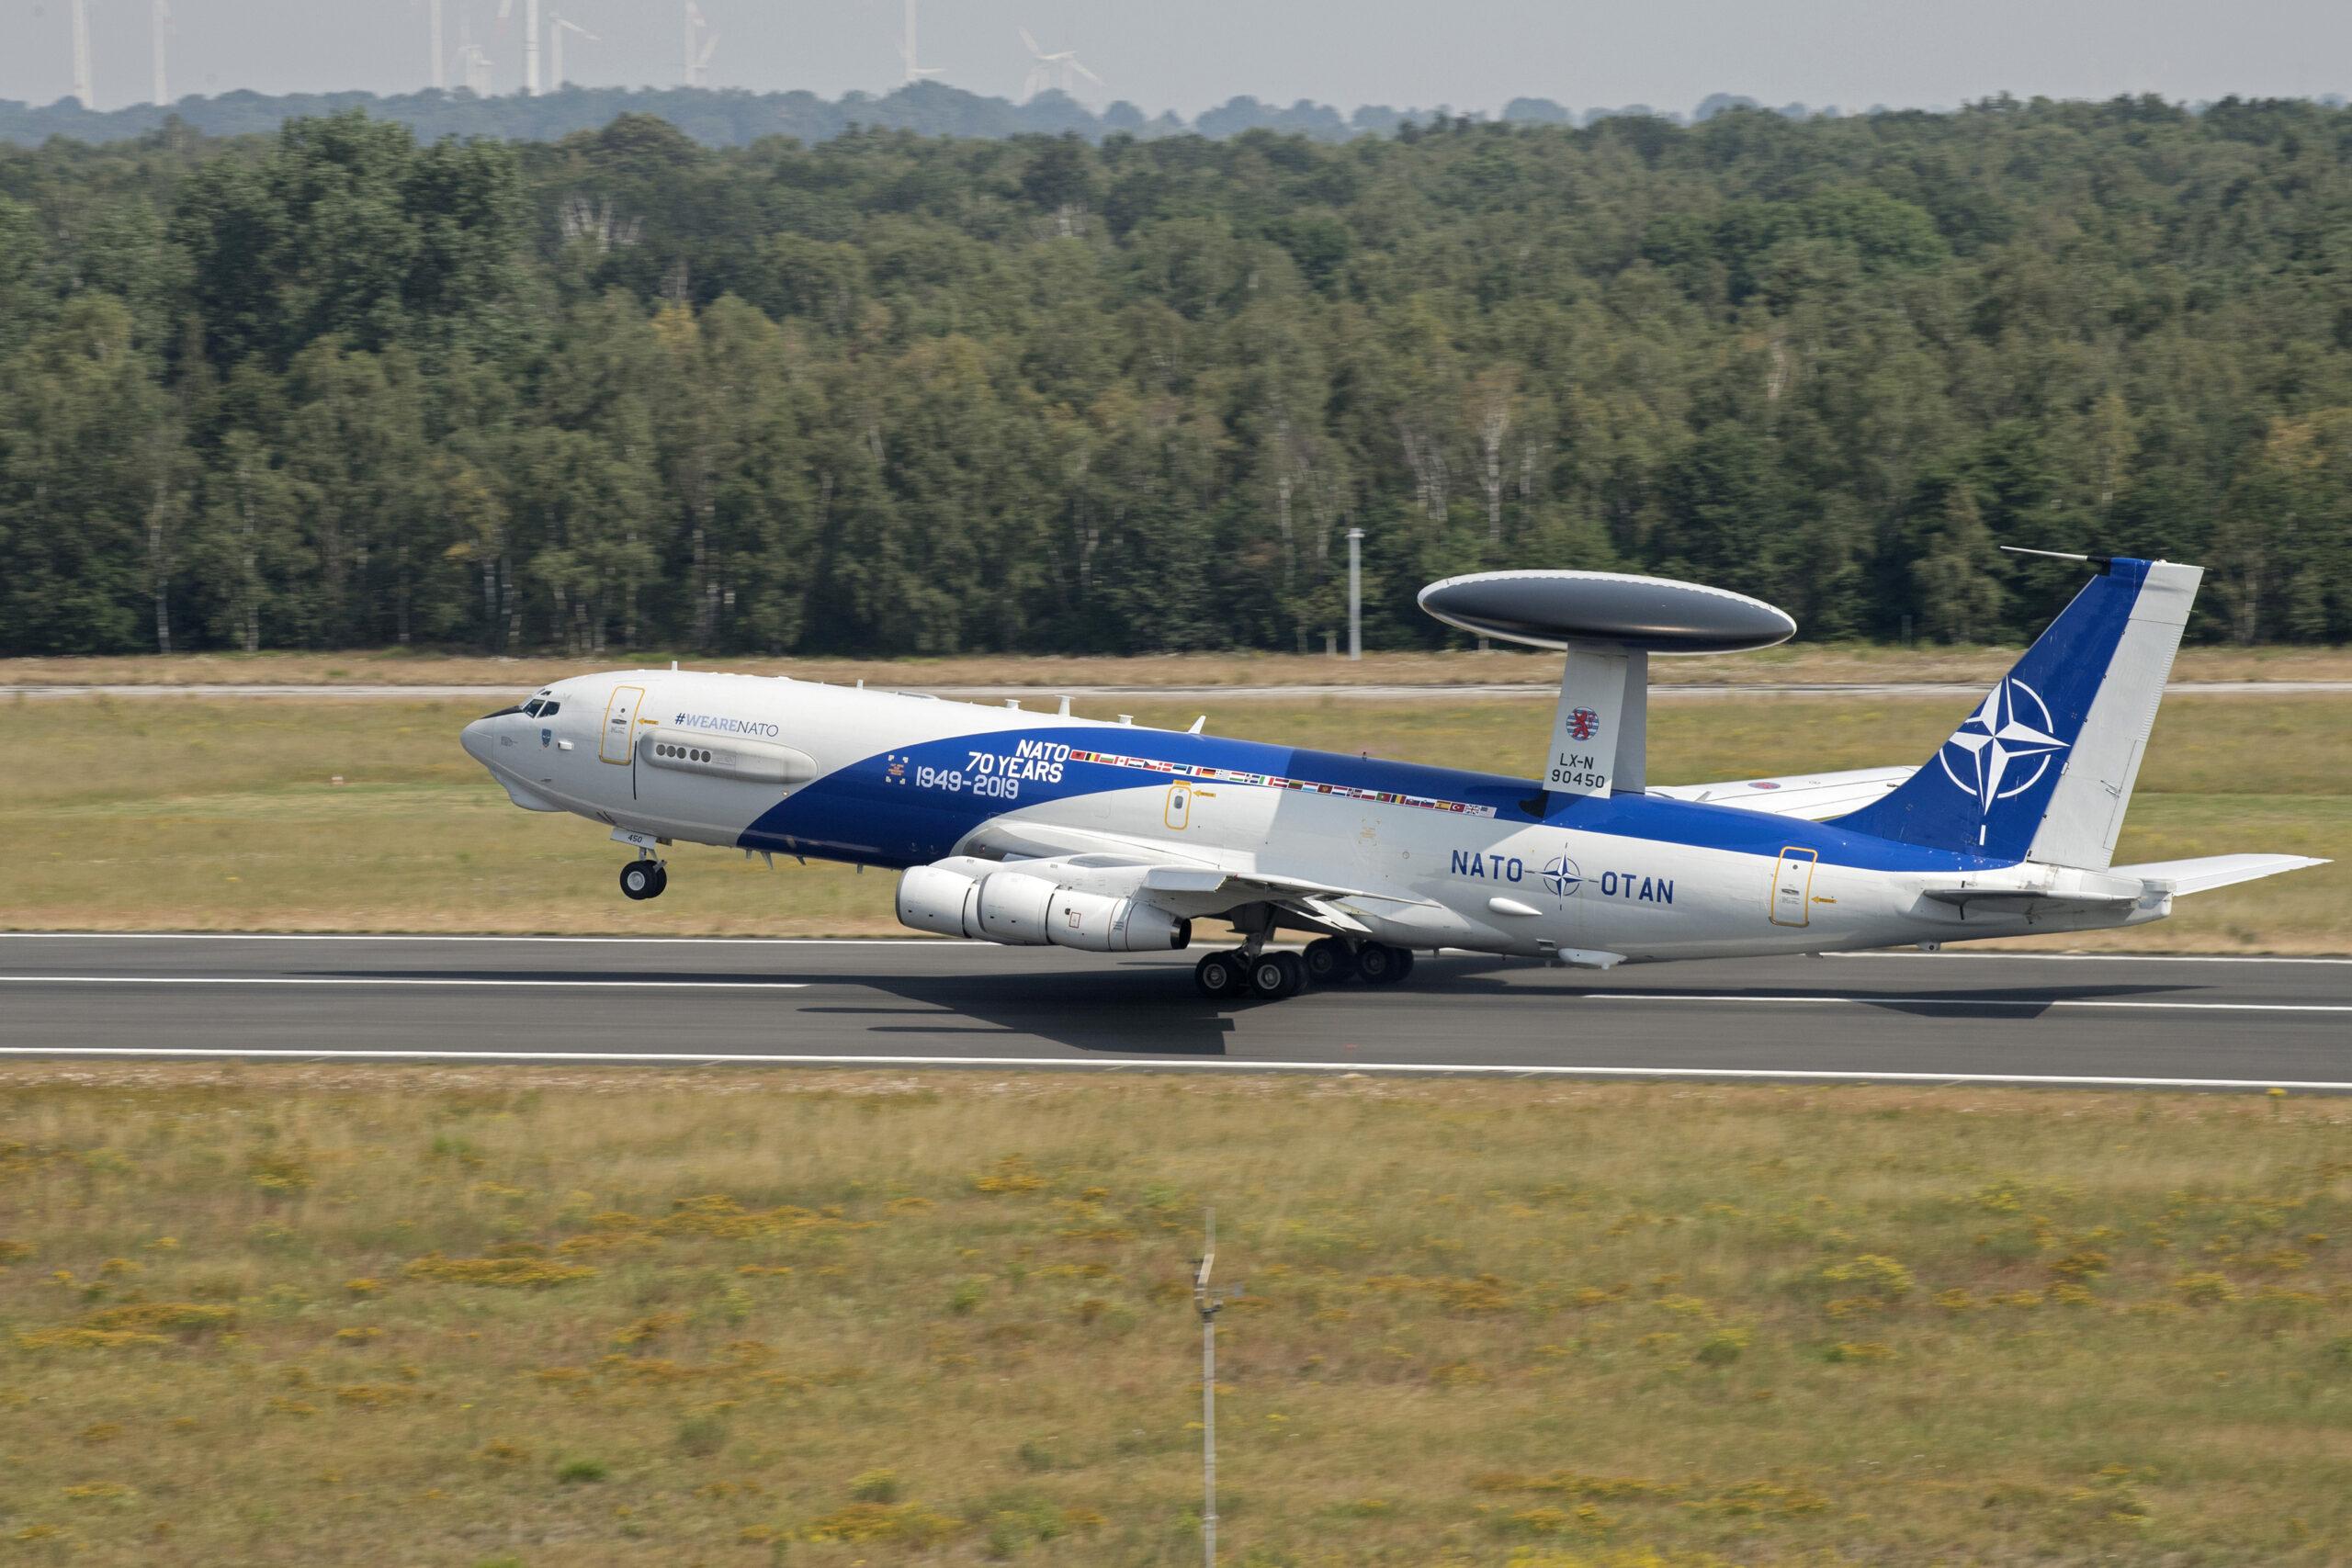 70 years NATO aircraft